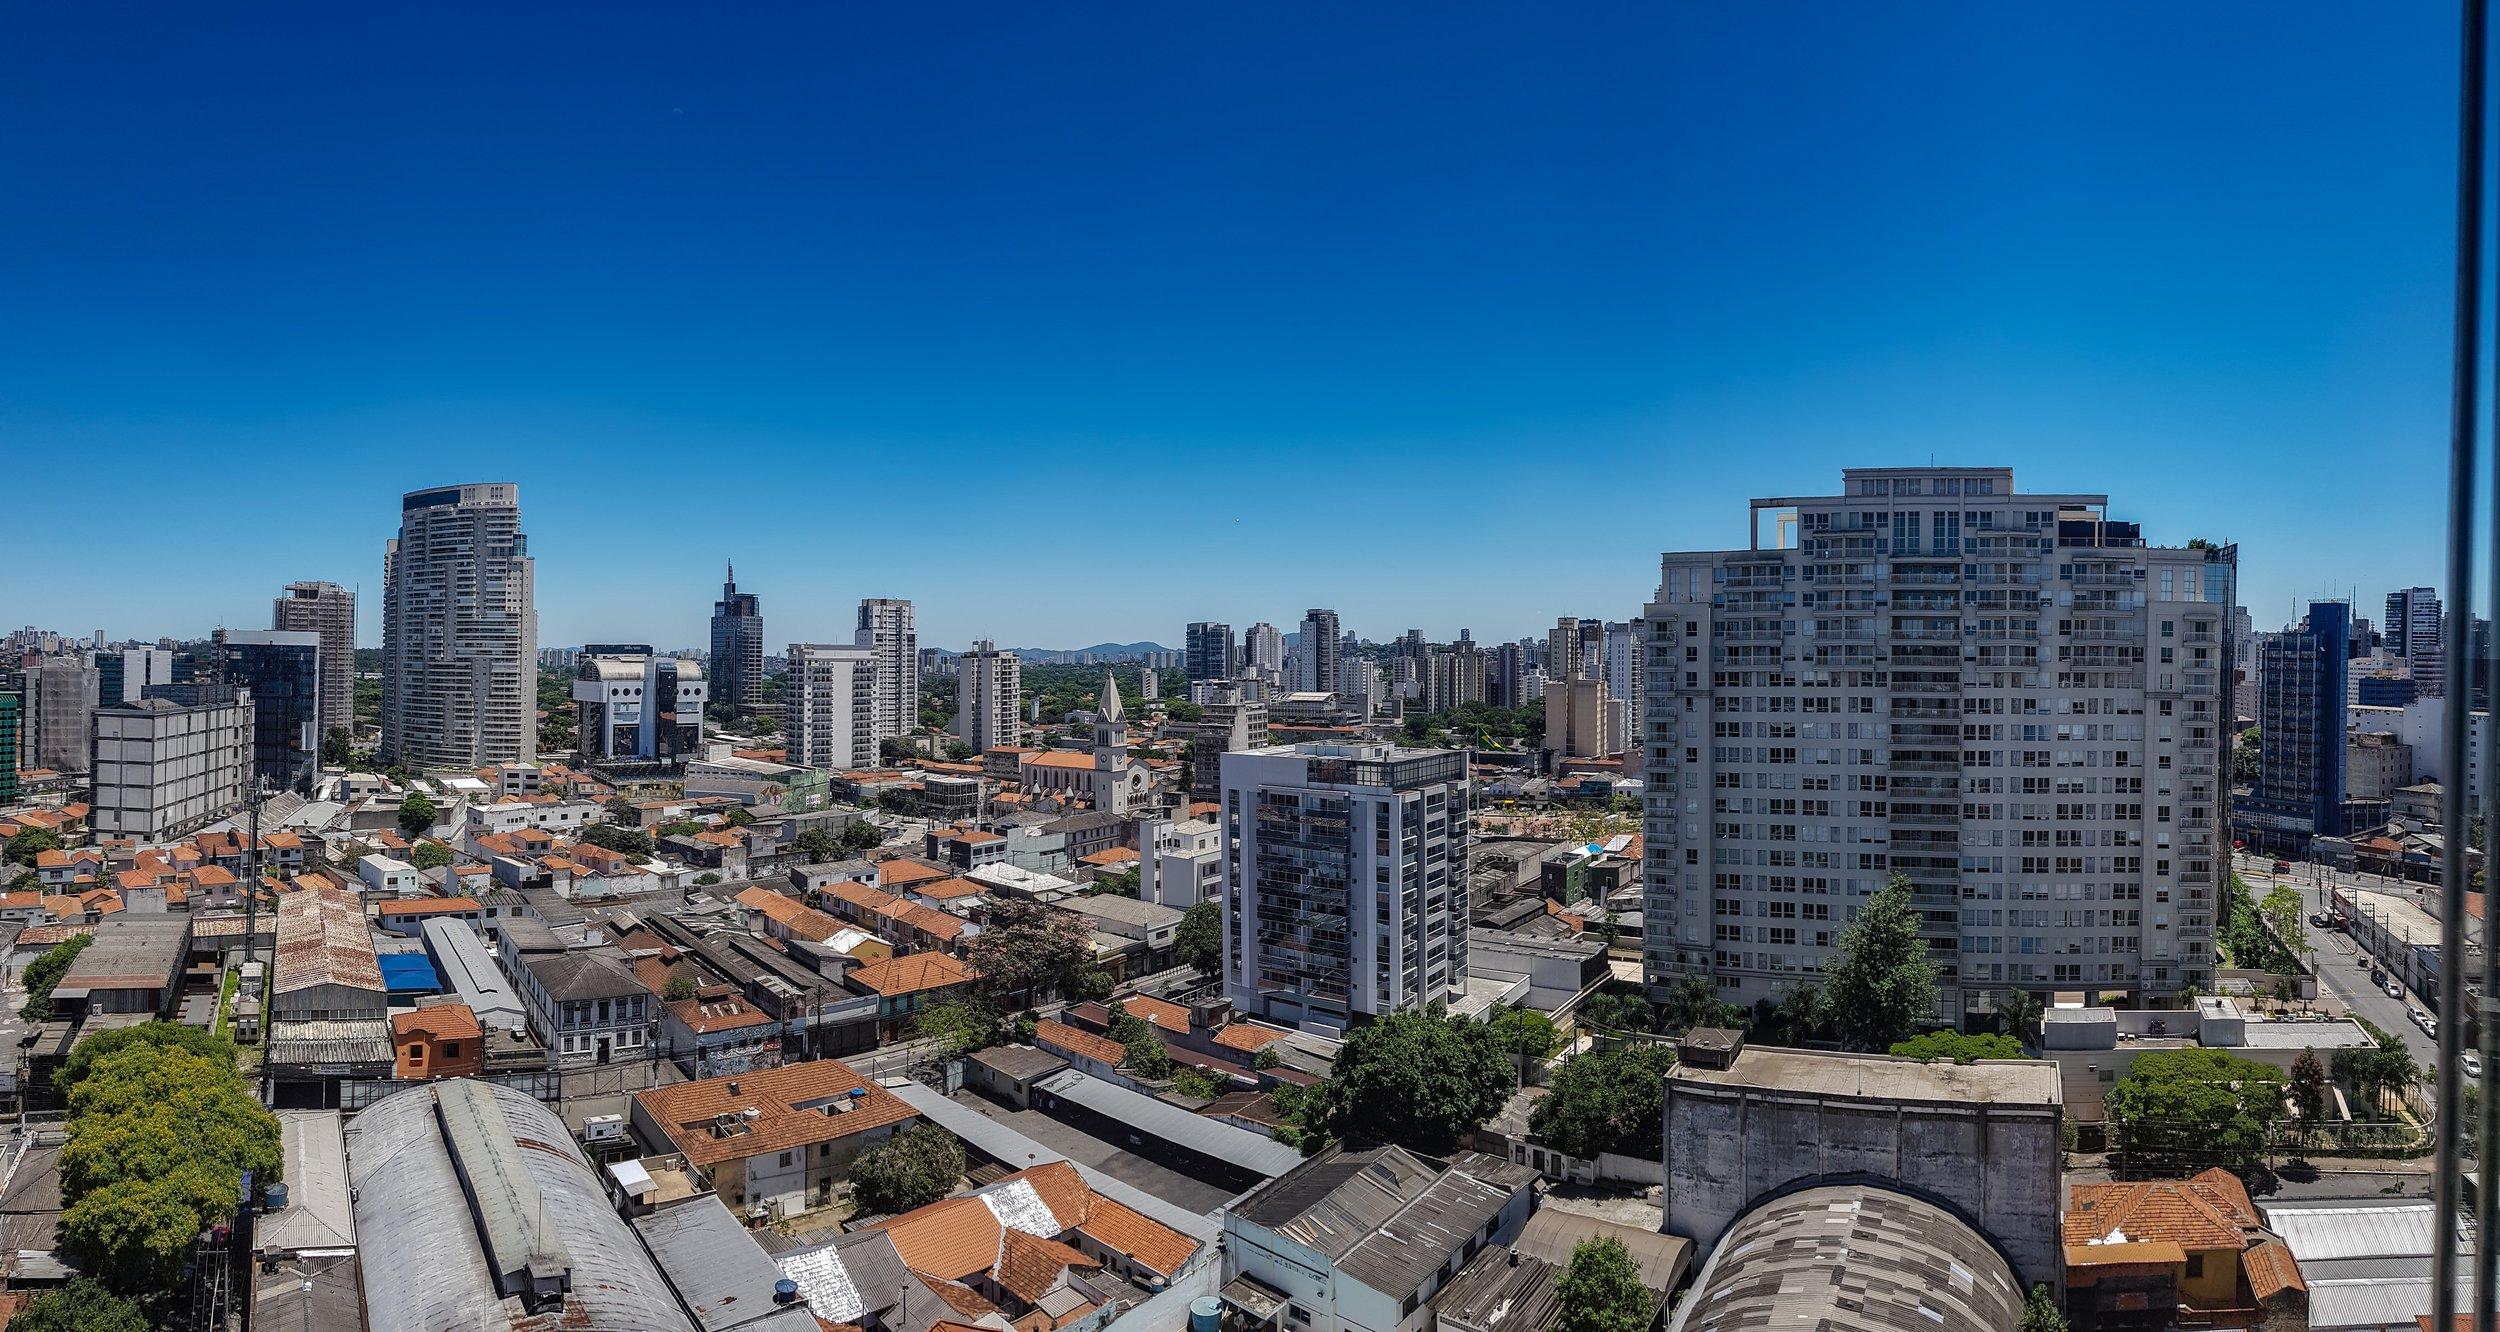 Pinheiros in São Paulo, Brasil